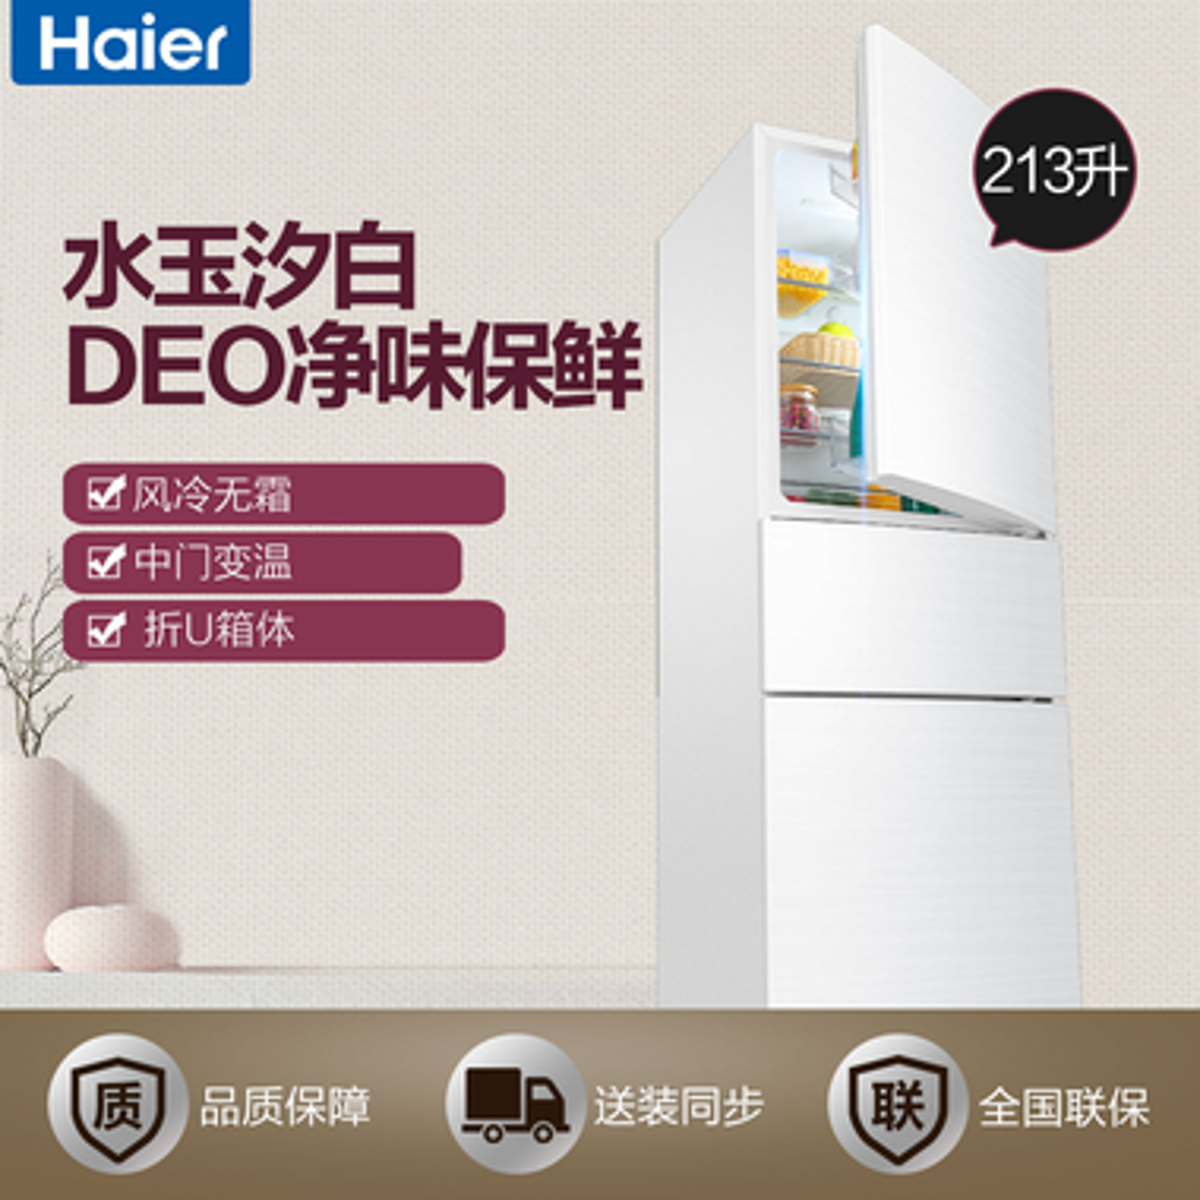 Haier/海尔 冰箱 BCD-213WMPV 213升三门小型家用风冷无霜冷藏冷冻冰箱